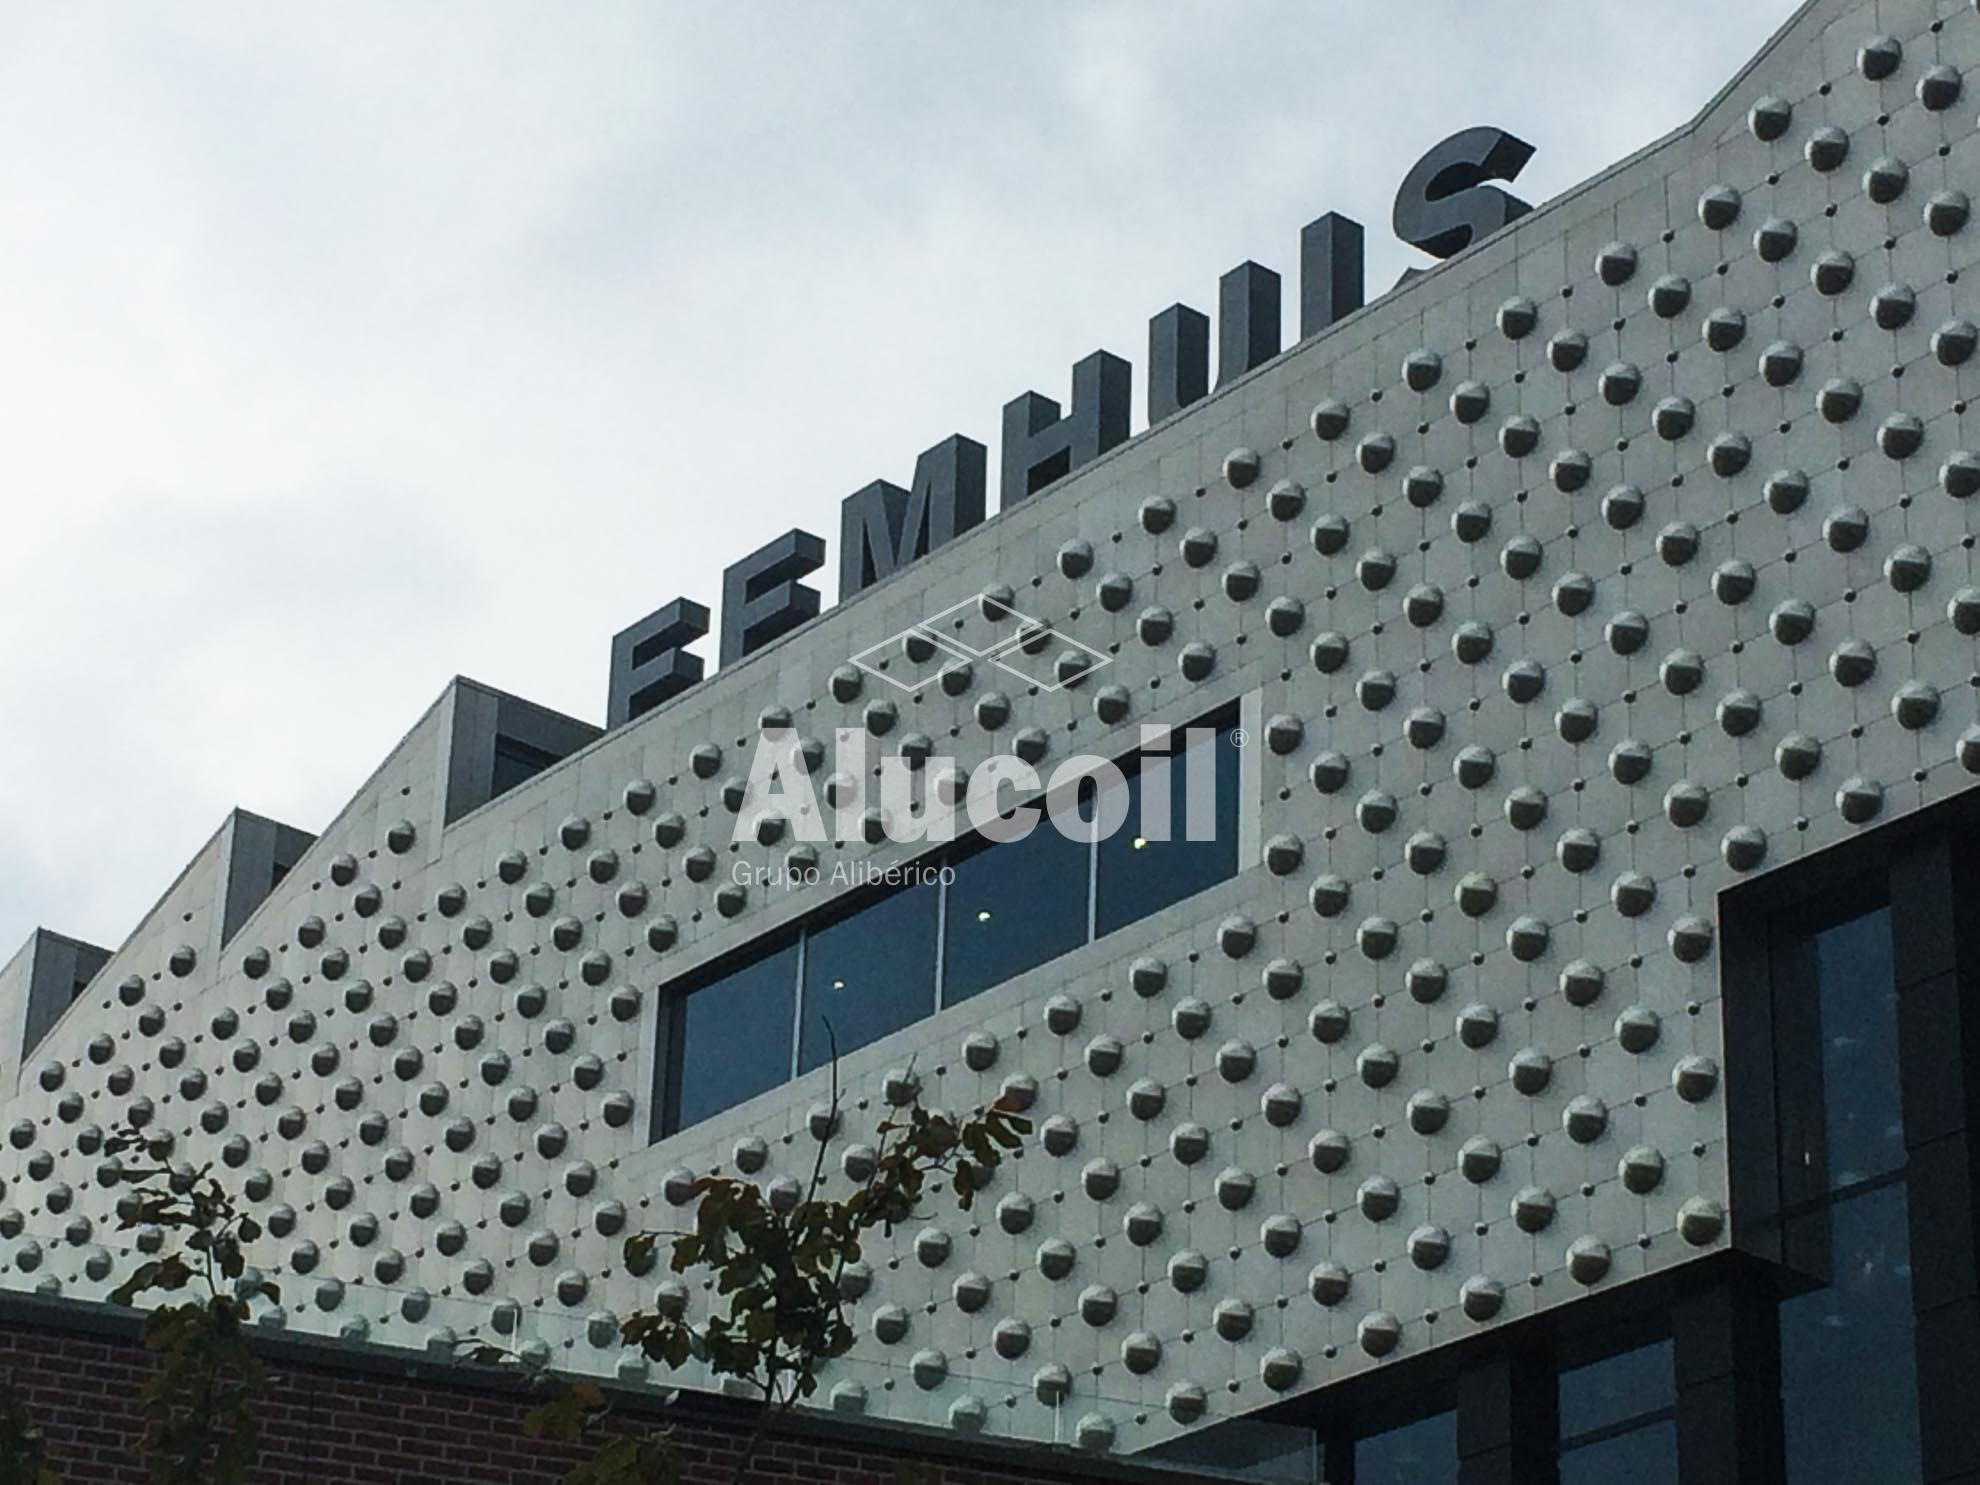 The Eemhuis